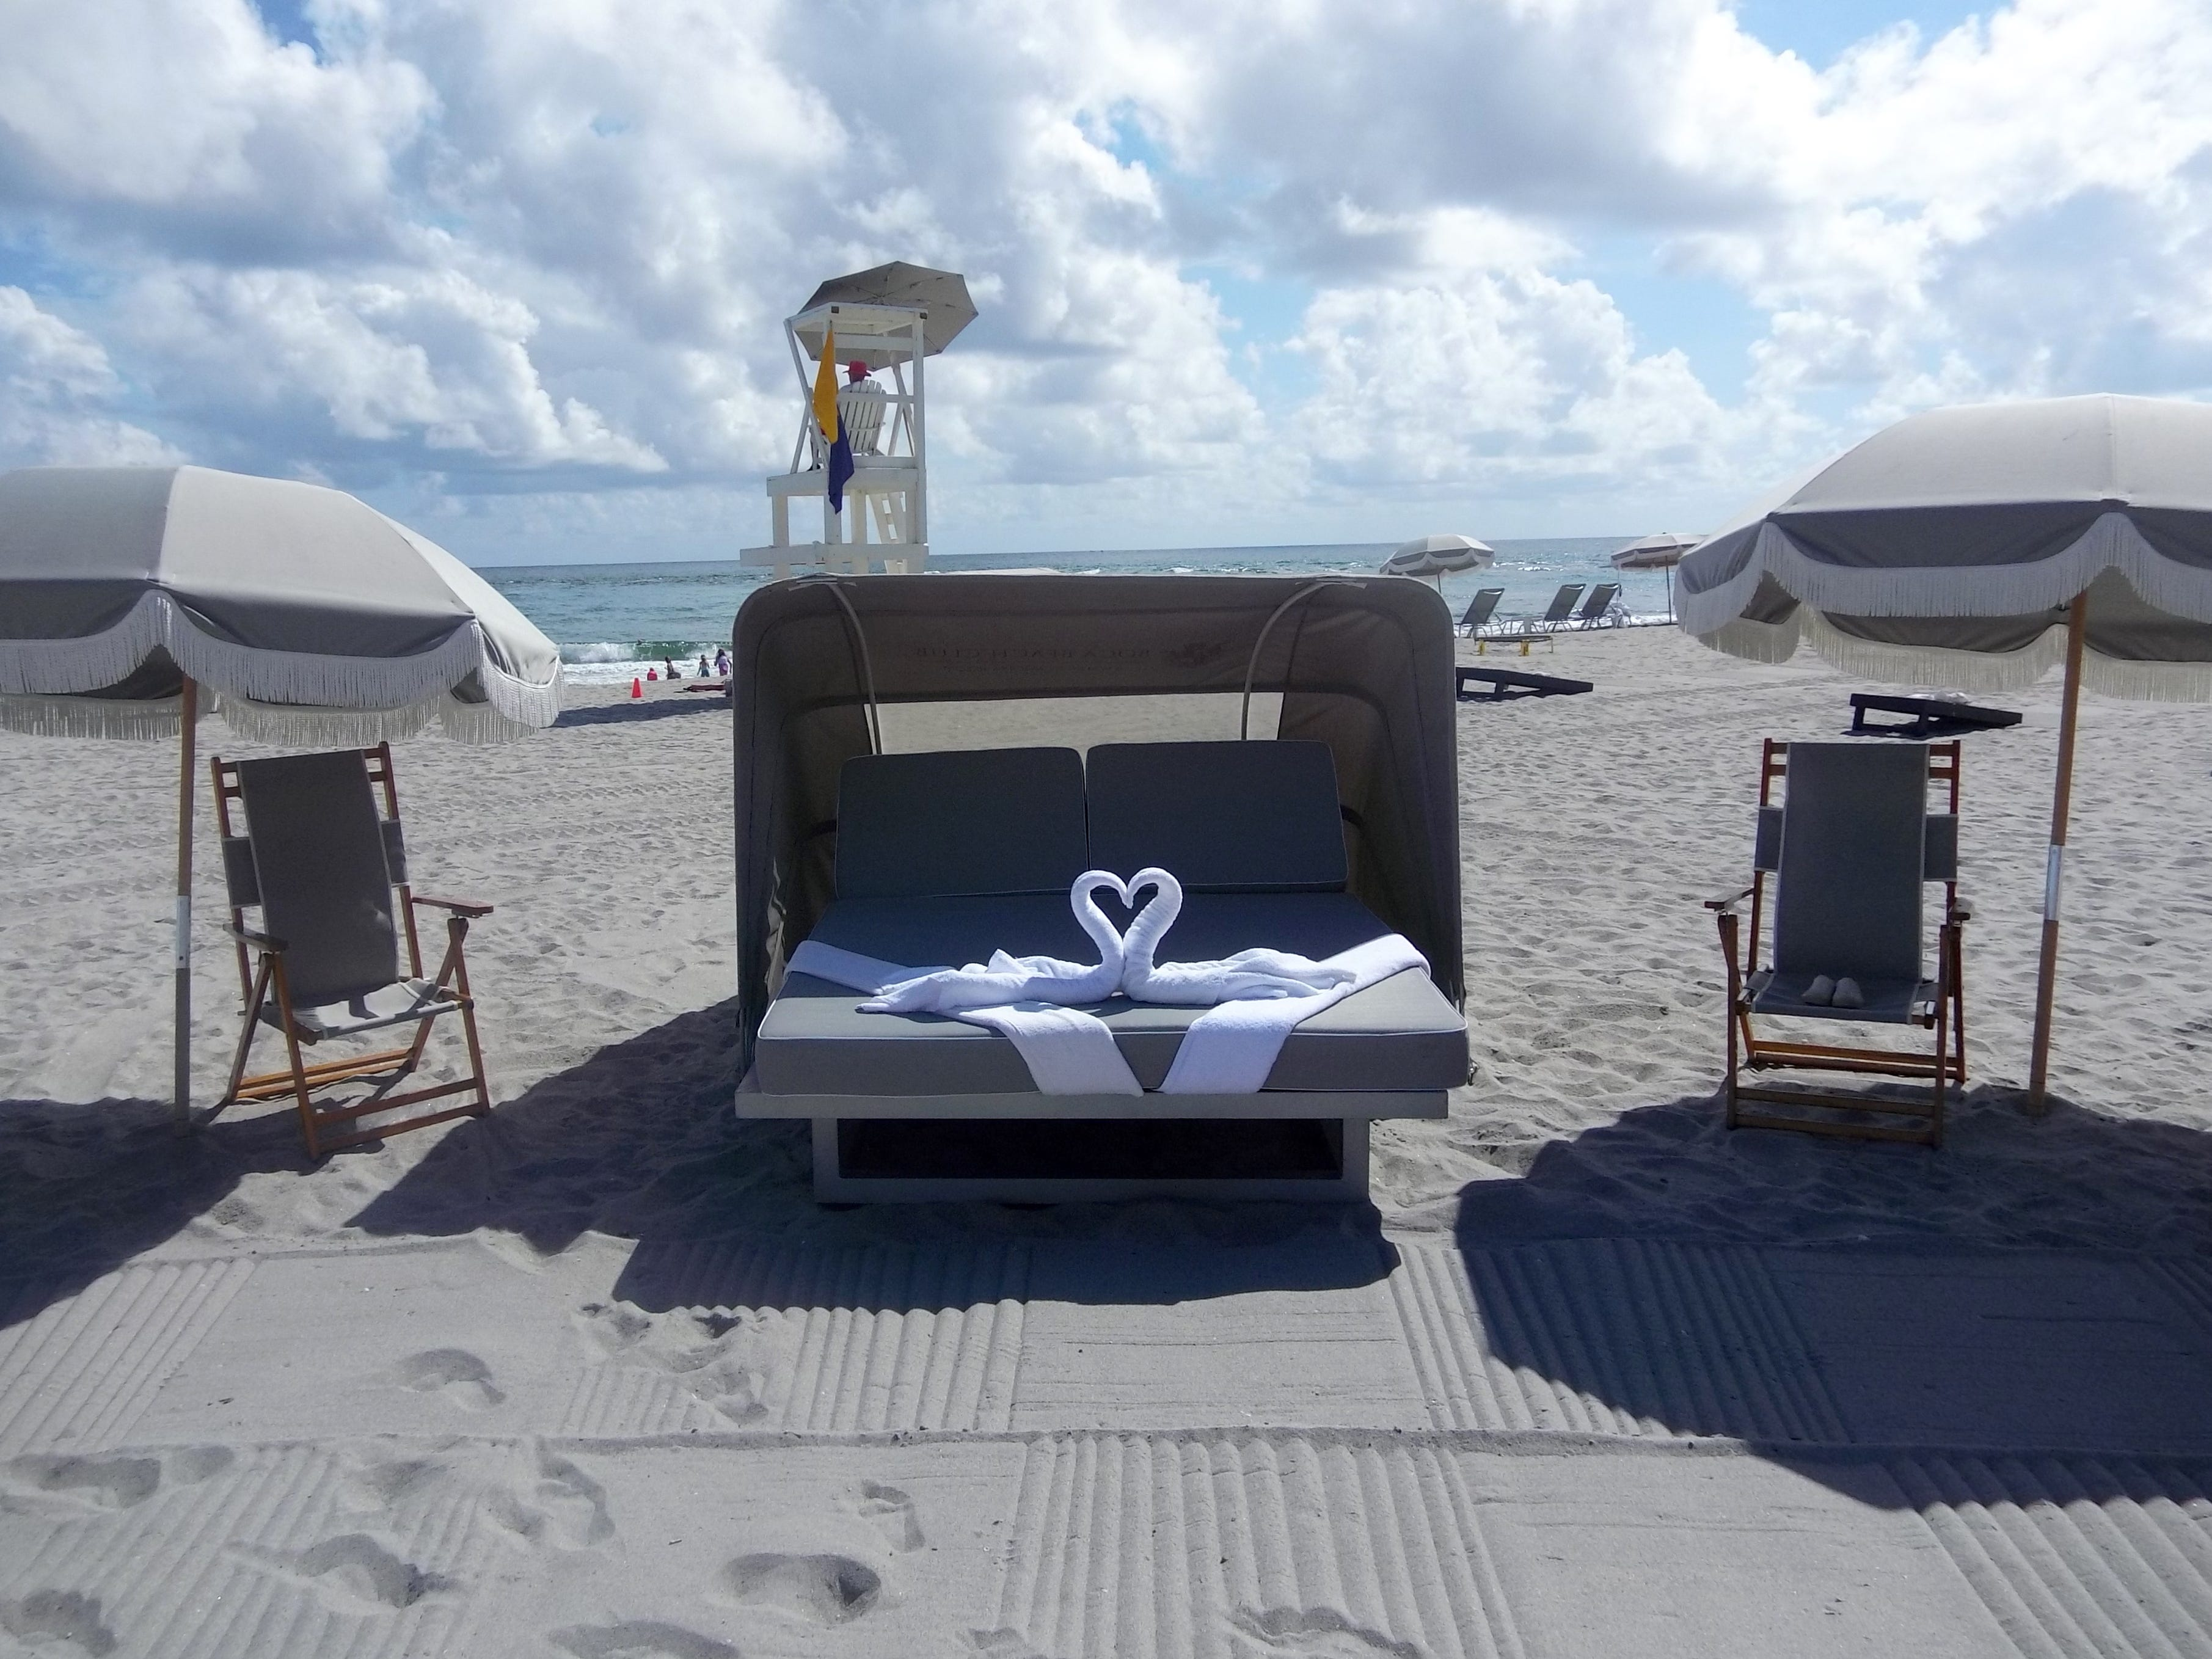 A day at the beach at Boca Beach Club and Boca Raton Resort & Club.